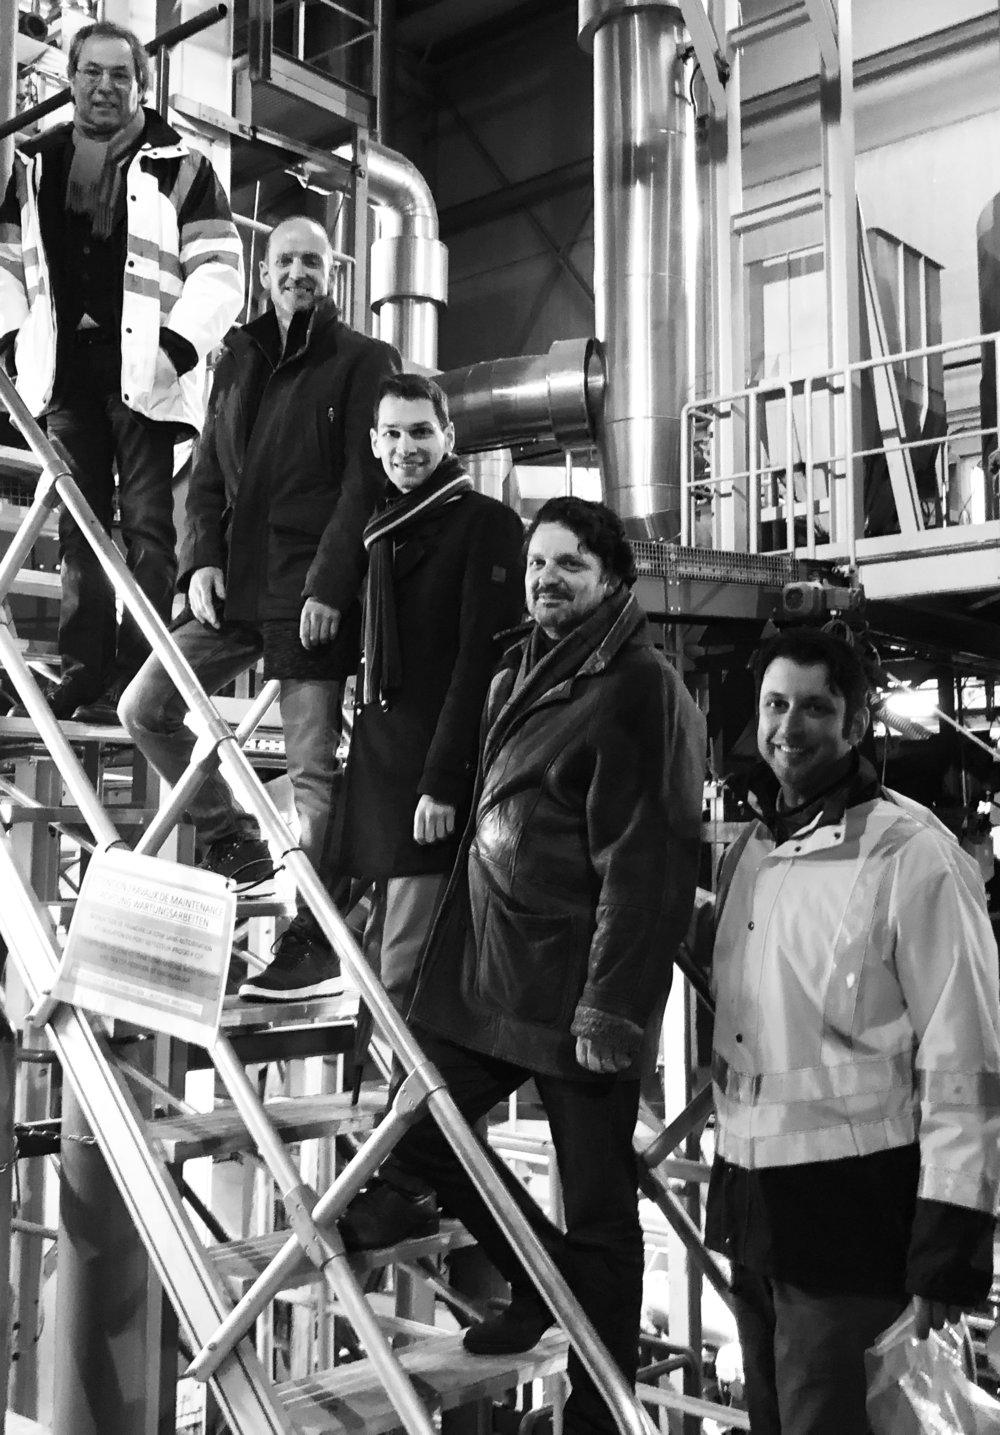 President of Soil Concept Marc Demoulling, Carbonauts Torsten Becker, Stephan Enge and Christoph Hiemer and Alex Kolomijchuk. Plant manager Ralf Köhler is still part of the Soil Concept team.